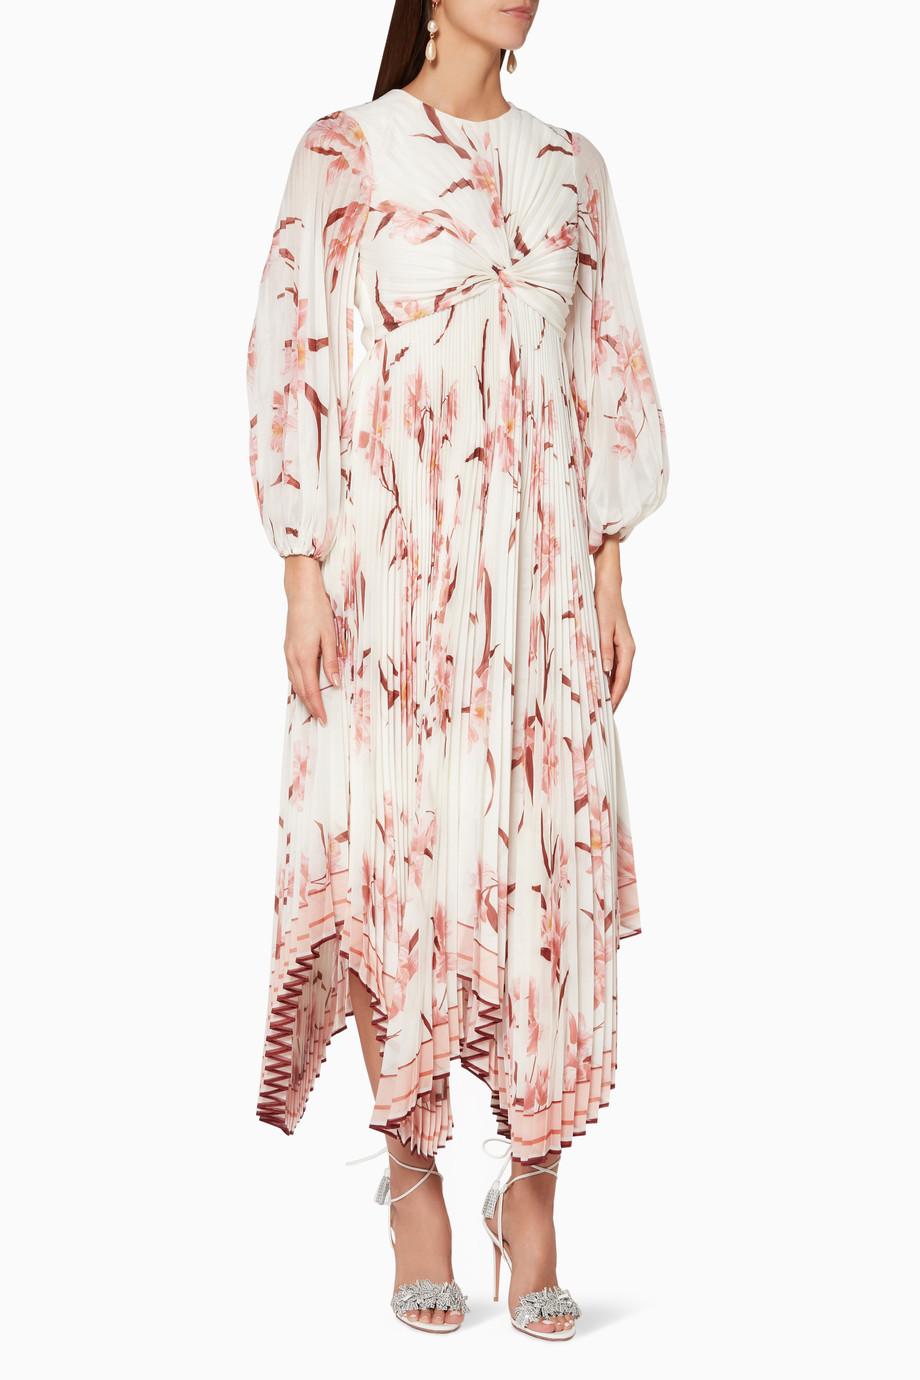 e76b5129a048 Shop Zimmermann Neutral Ivory Floral-Print Corsage Pleated Dress ...